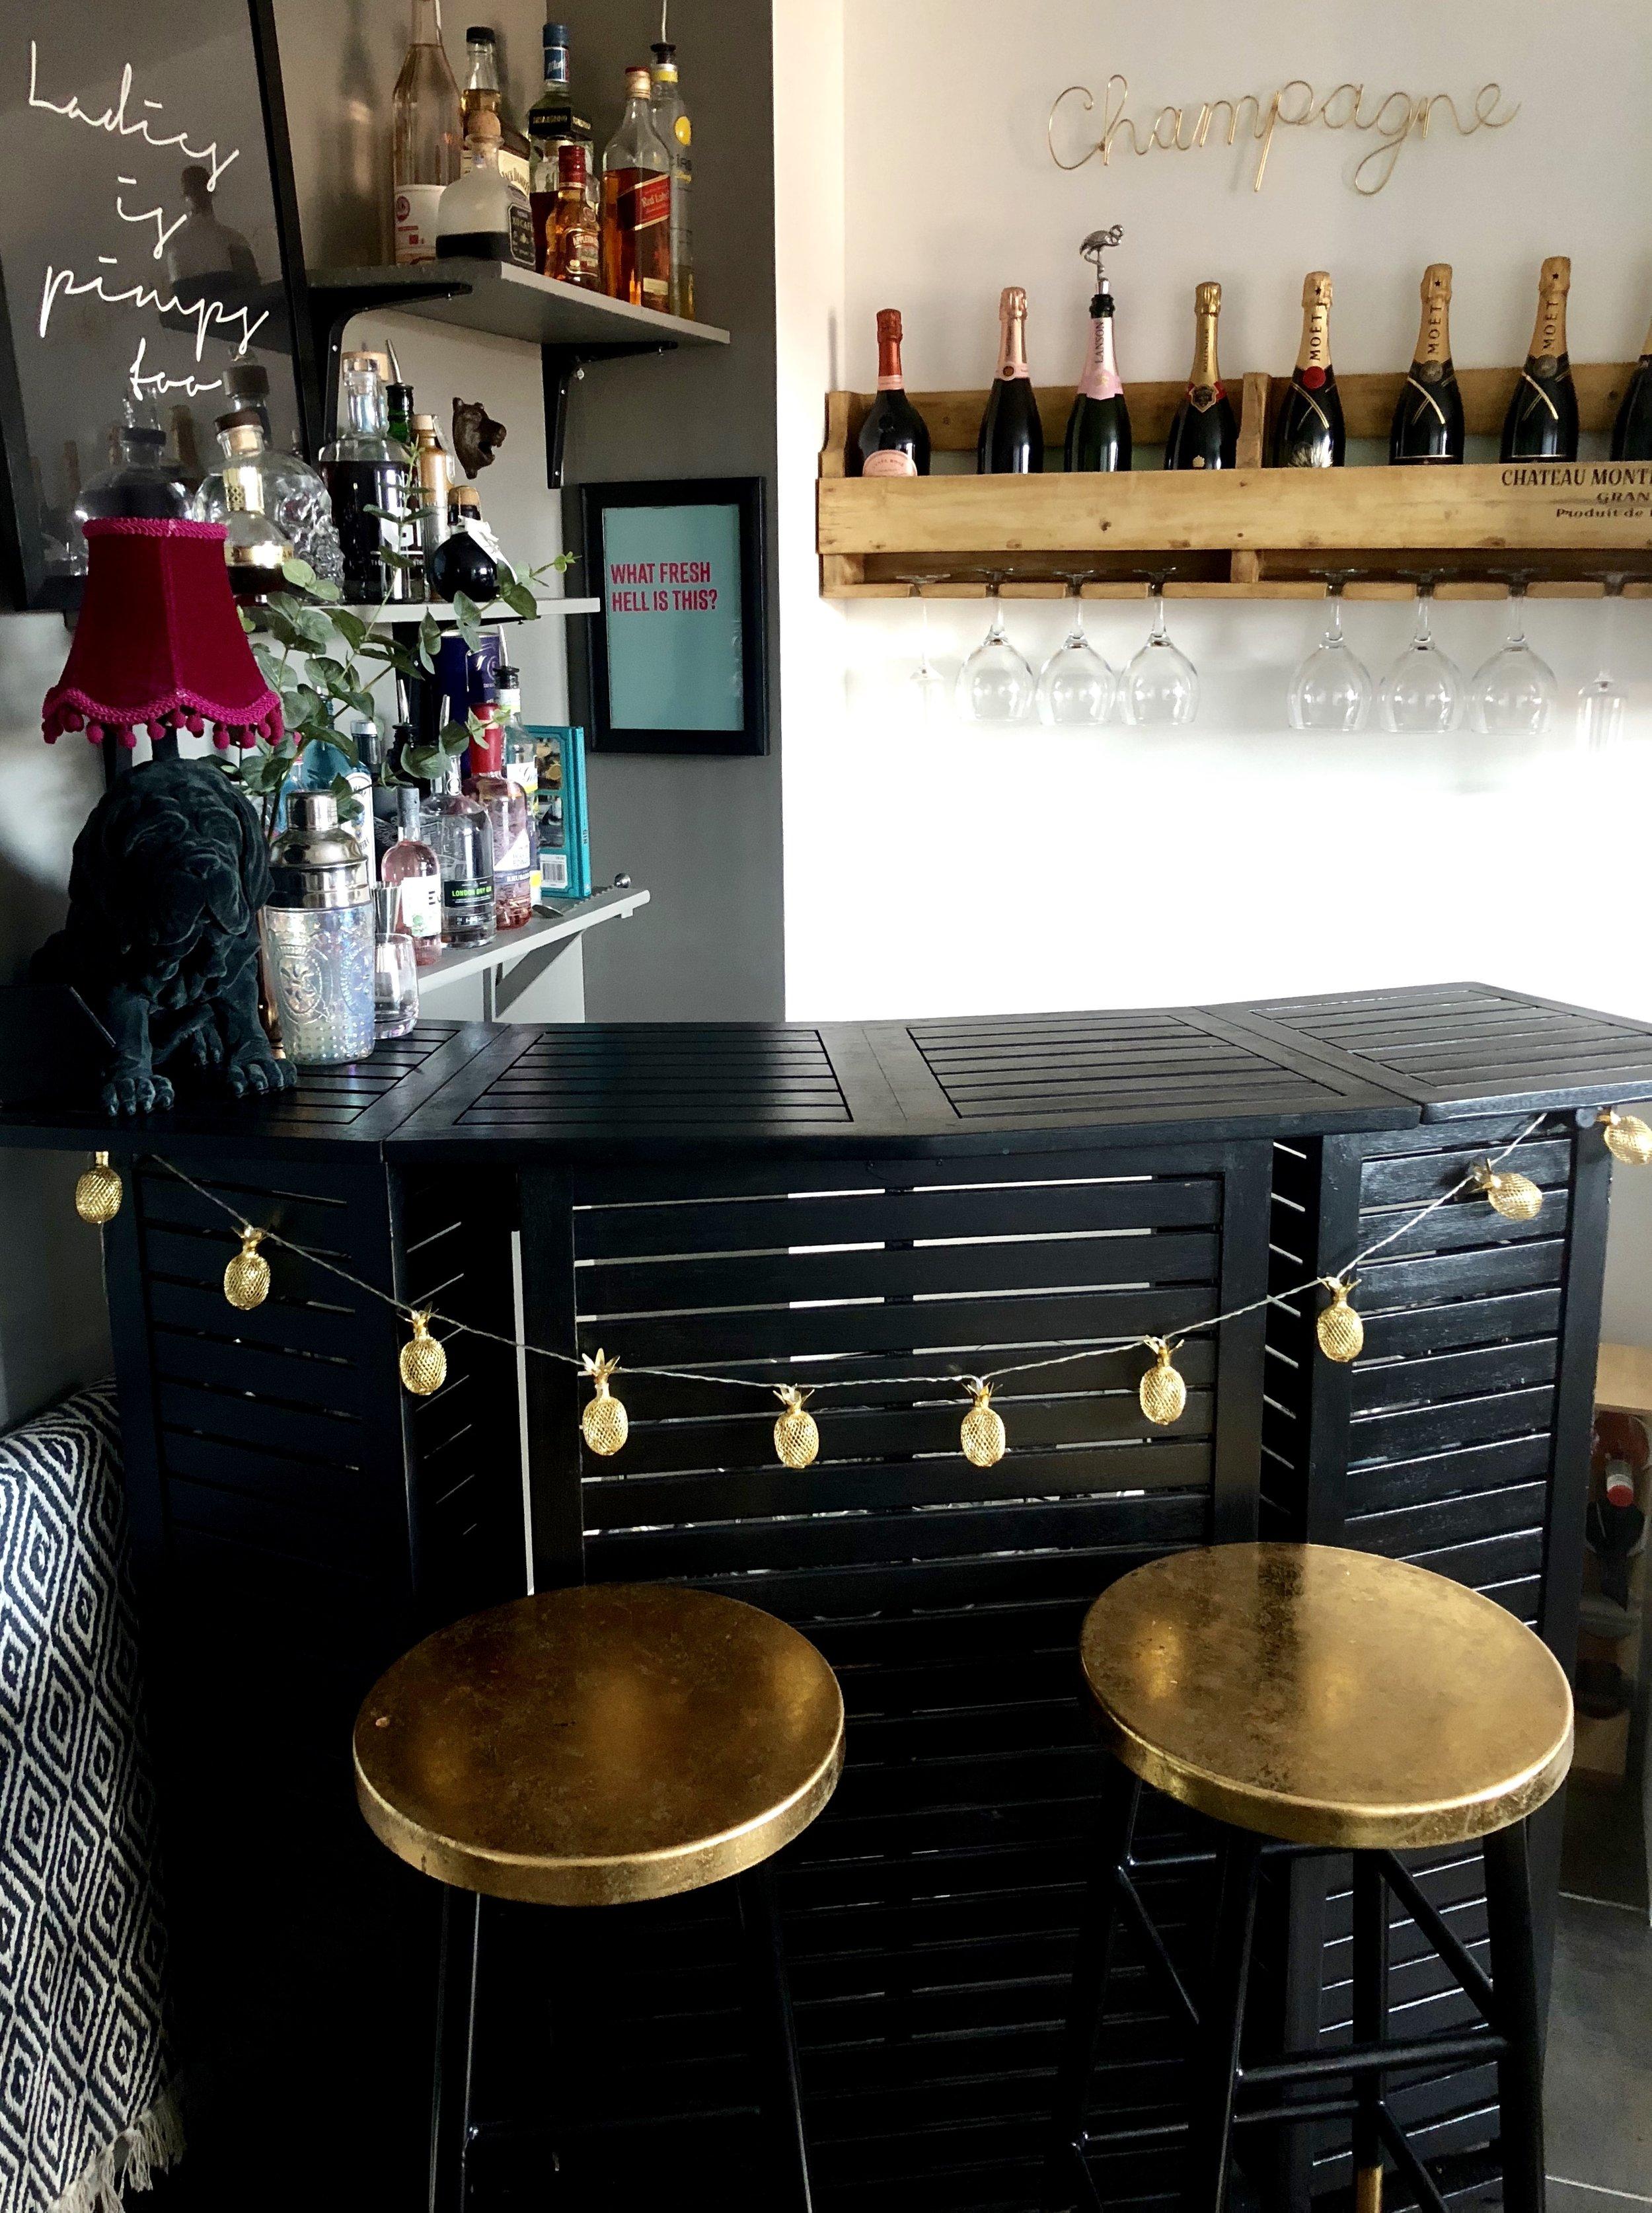 Champagne Rack-  acacia home.co.uk   ...... Gold Pineapple String Lights-   asos.com